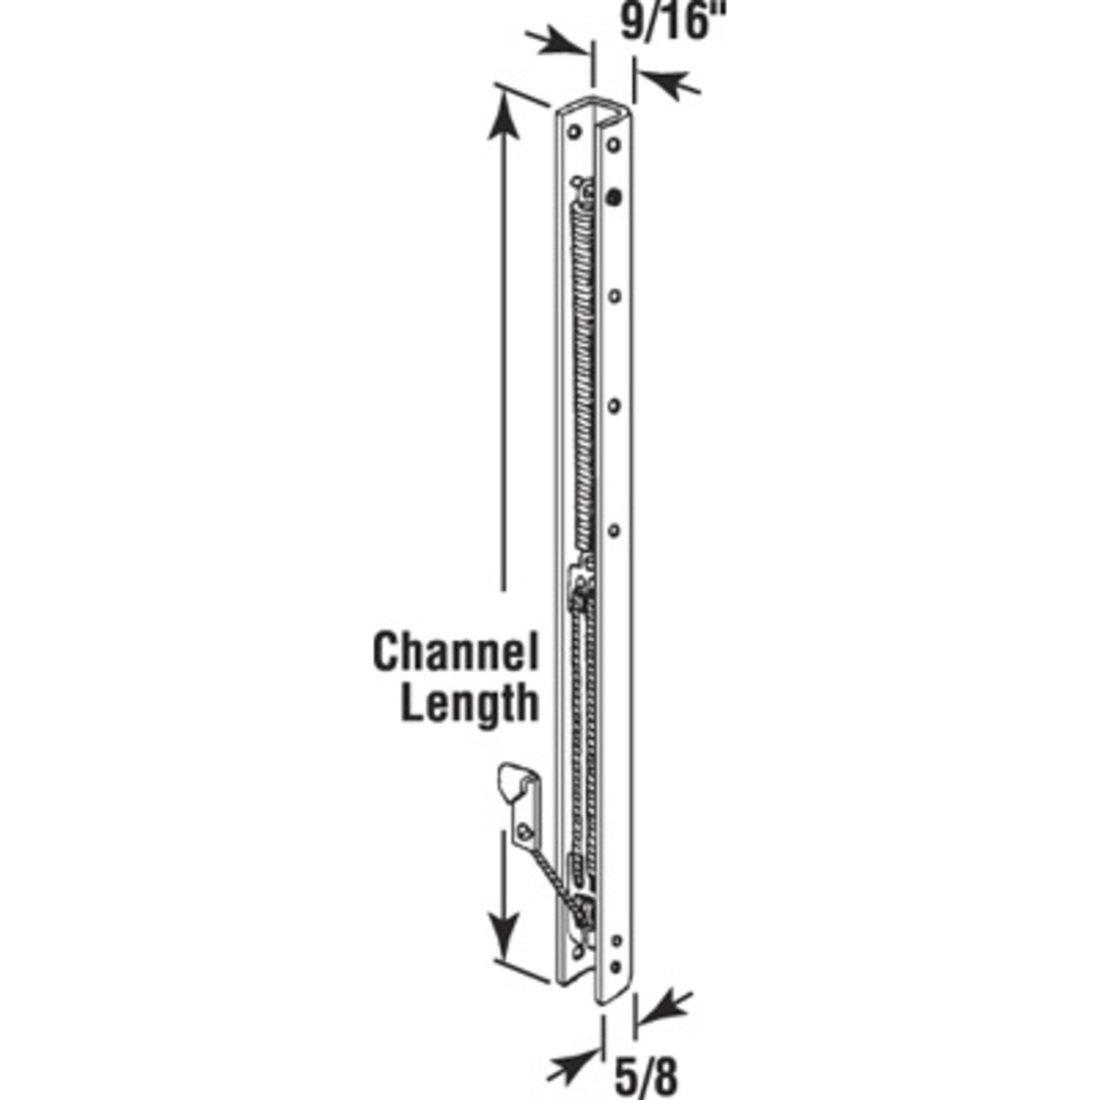 17 Window Channel Balance; 1620 or 16B C.R LAURENCE